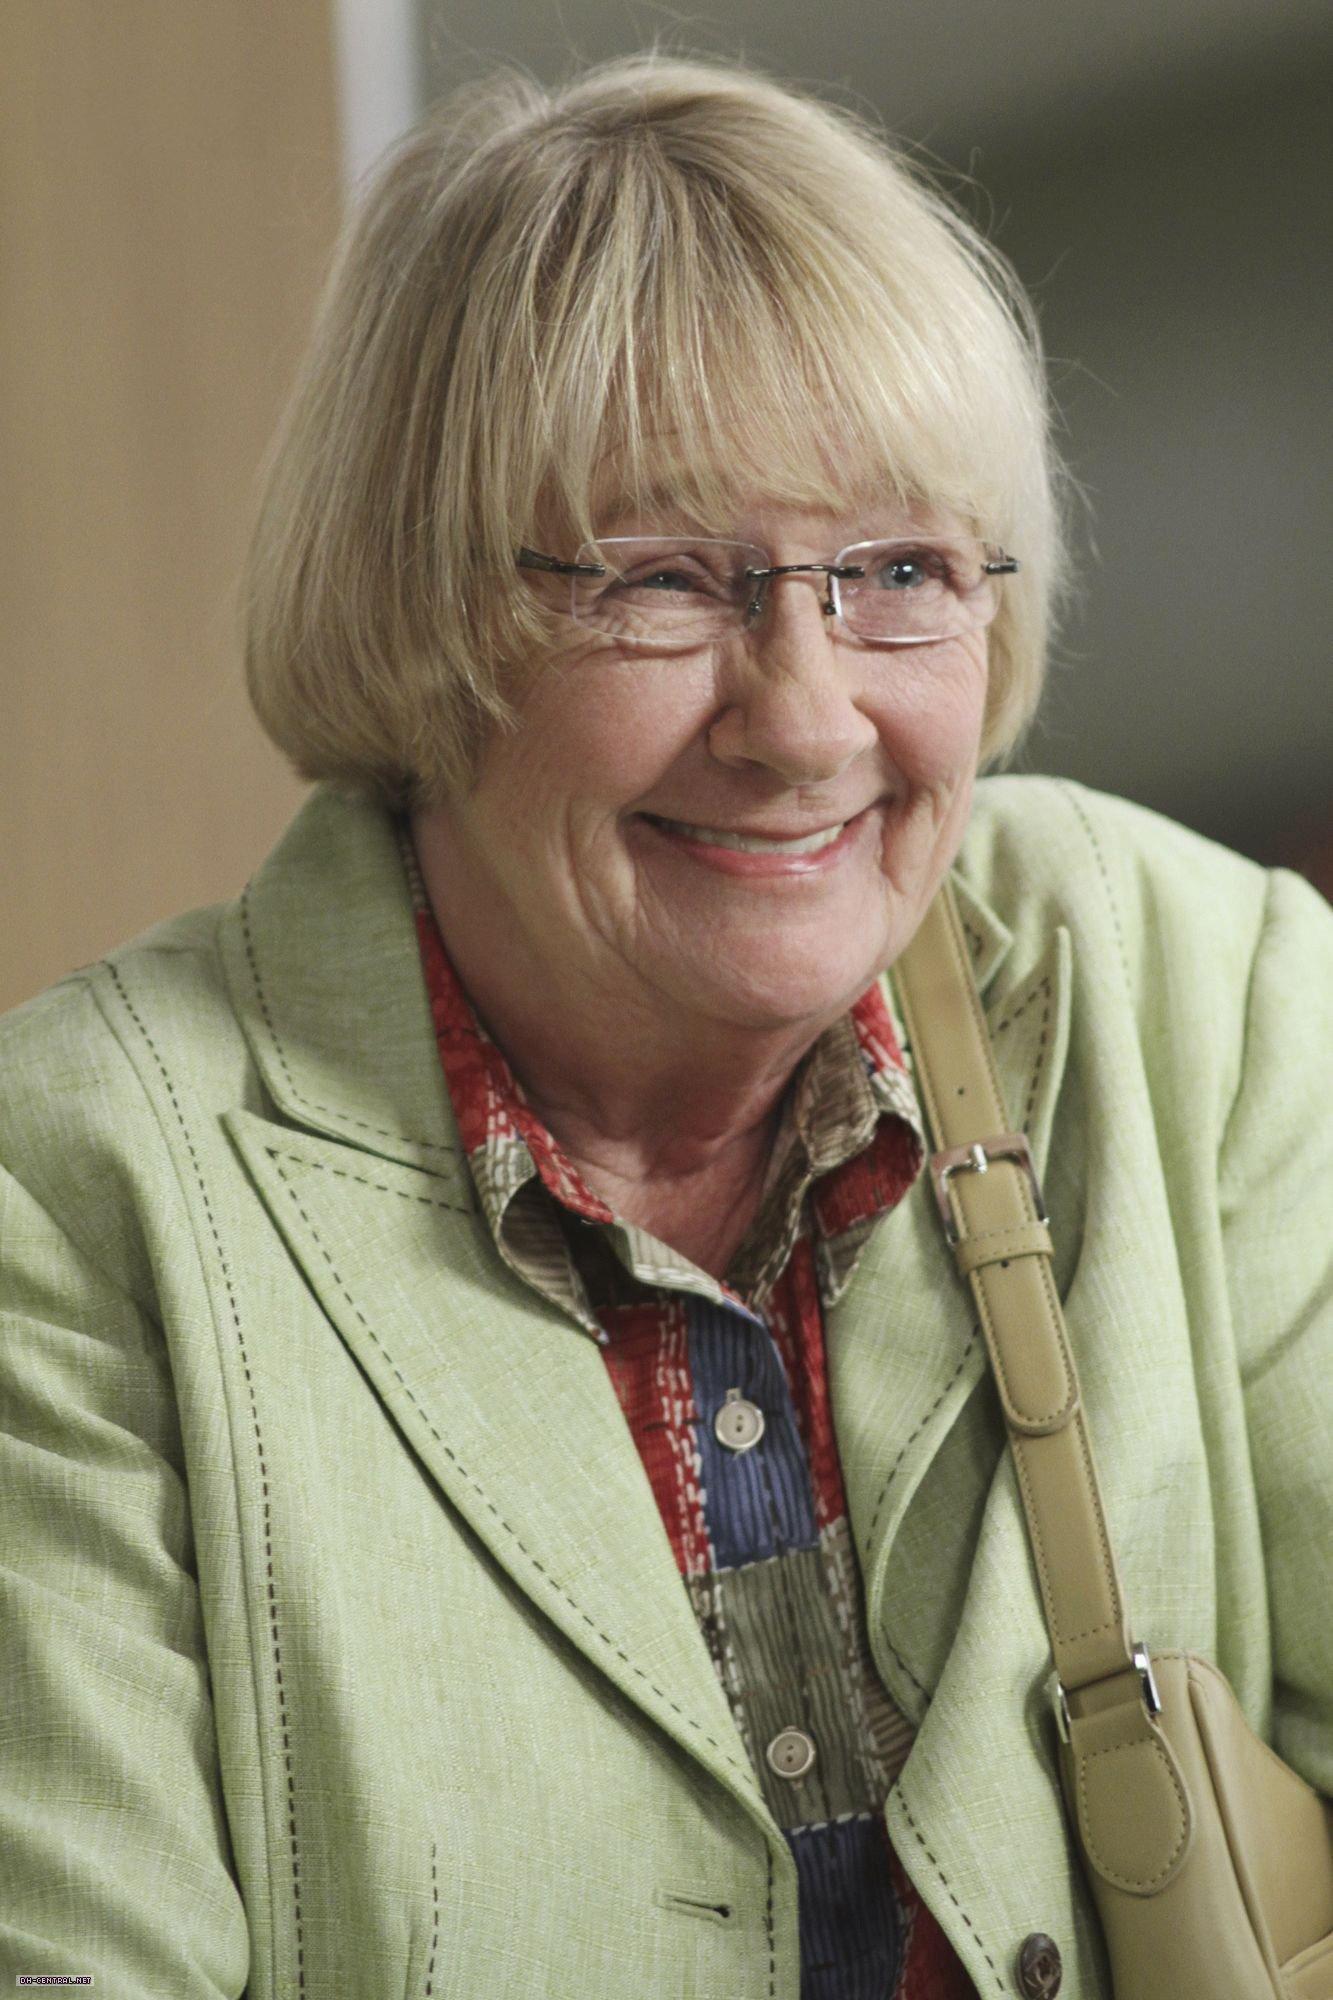 Loni Anderson born August 5, 1946 (age 72) advise